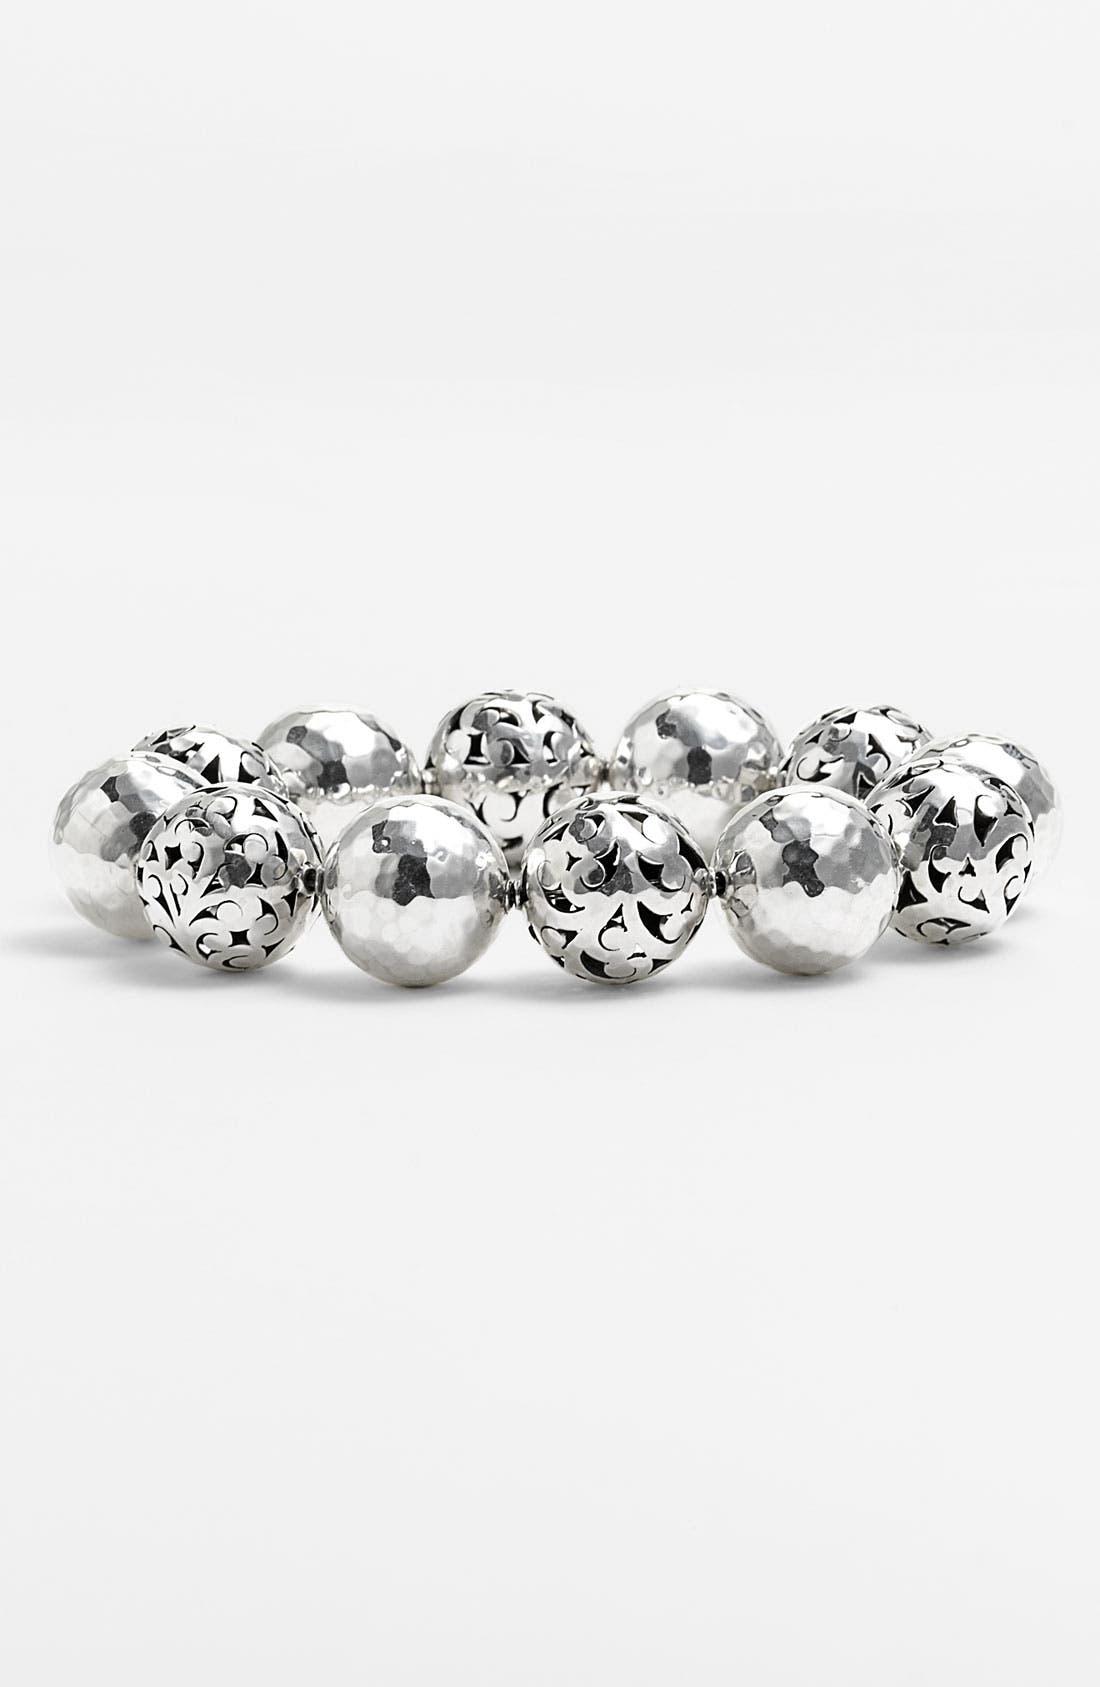 Main Image - Lois Hill 'Ball & Chain' Stretch Bracelet